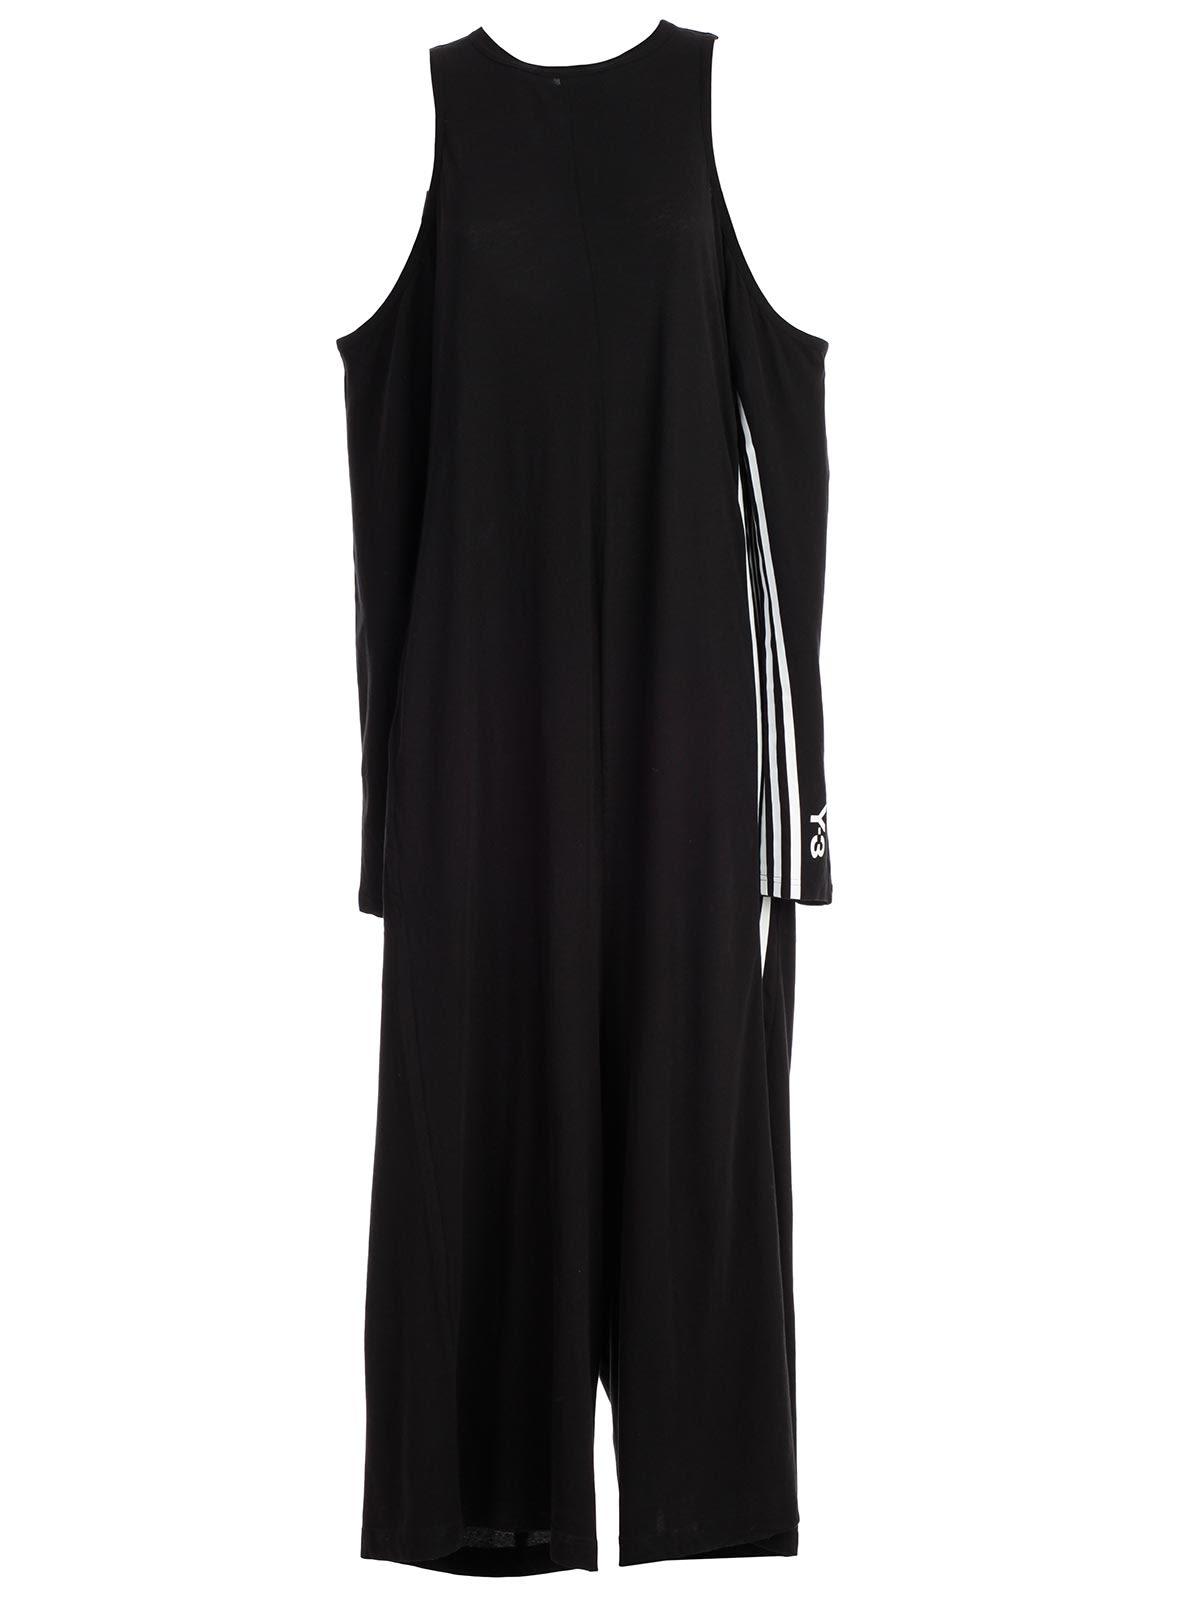 d7830ed134d5 Y-3 Y-3 Yohji Yamamoto Adidas Logo Jumpsuit - Black - 10797315